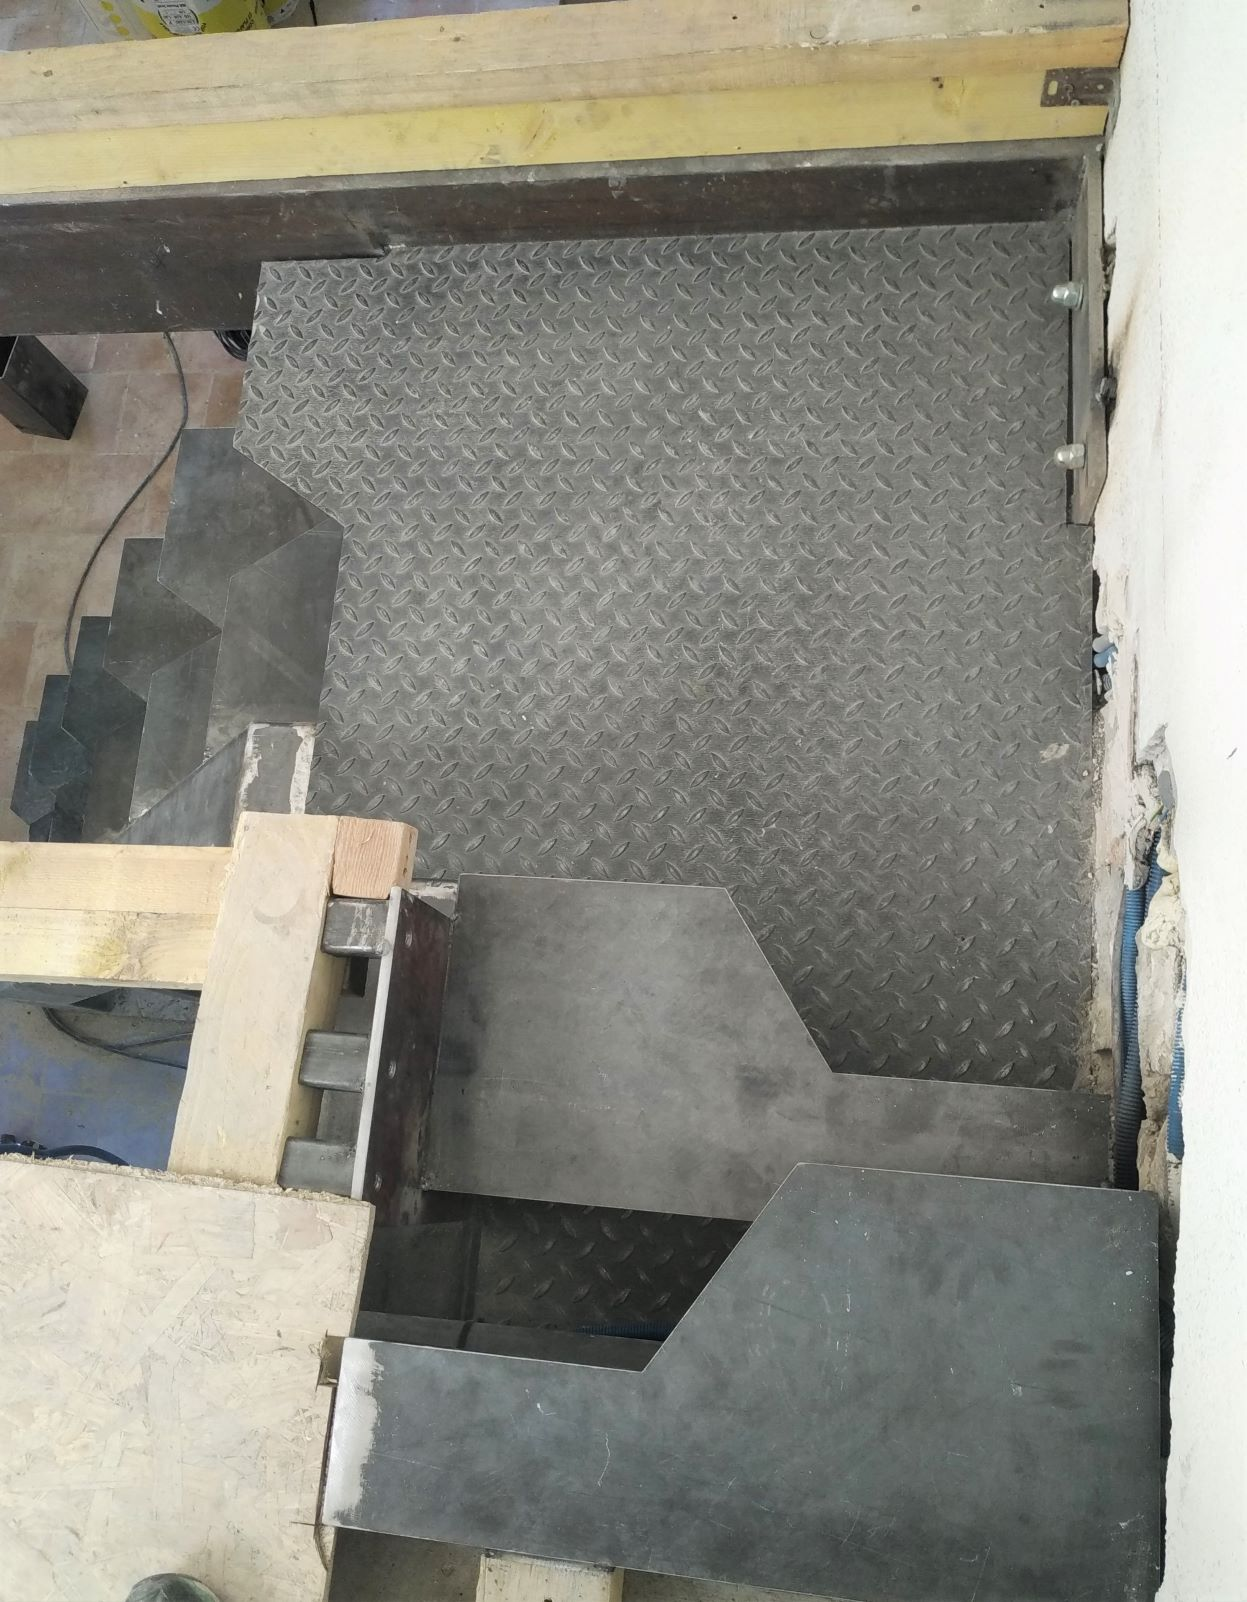 inoxngo ferronnier Marseille - fabrication escalier pas japonais 1r